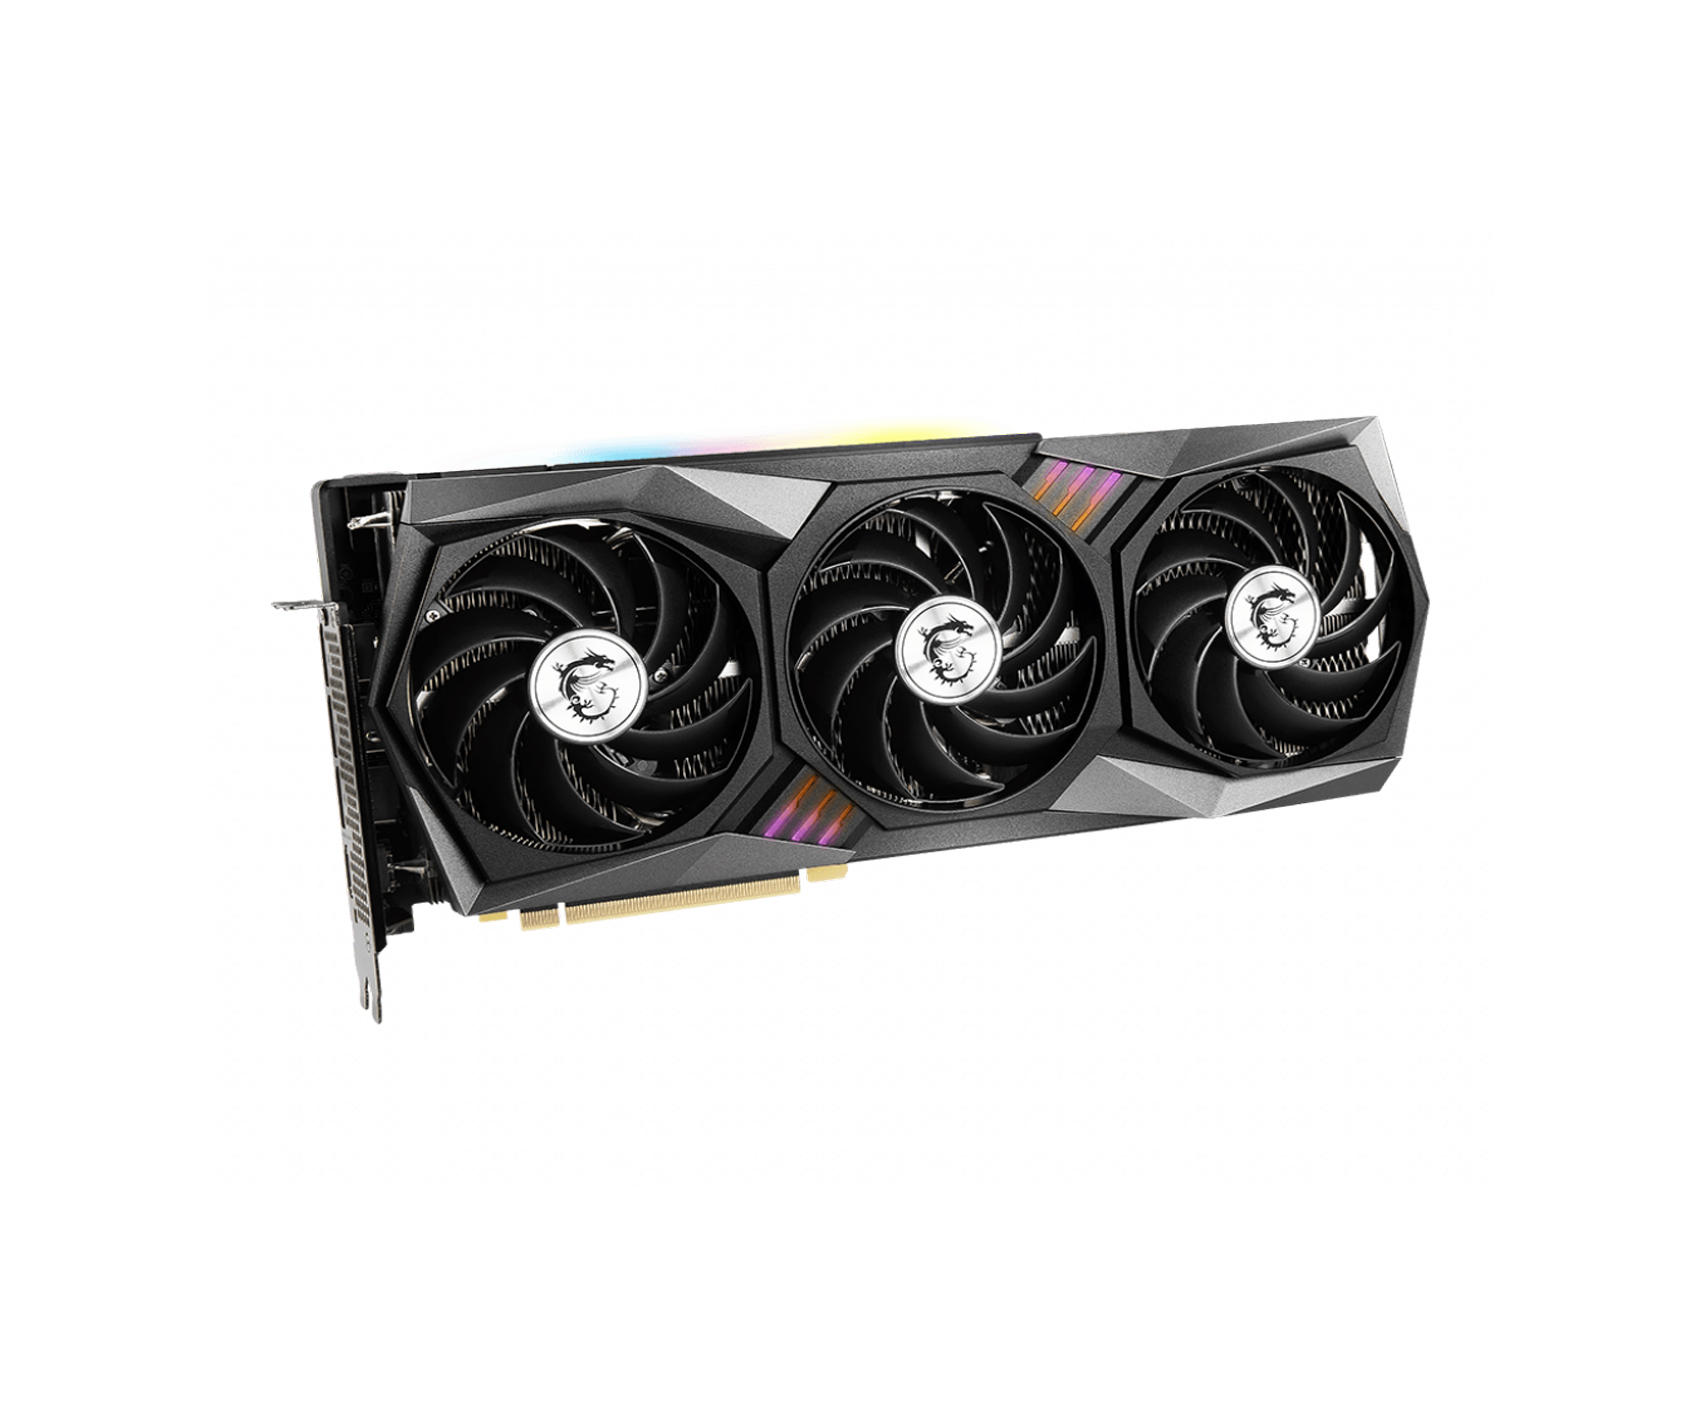 MSI GeForce RTX 3070 Gaming Trio Plus 8GB